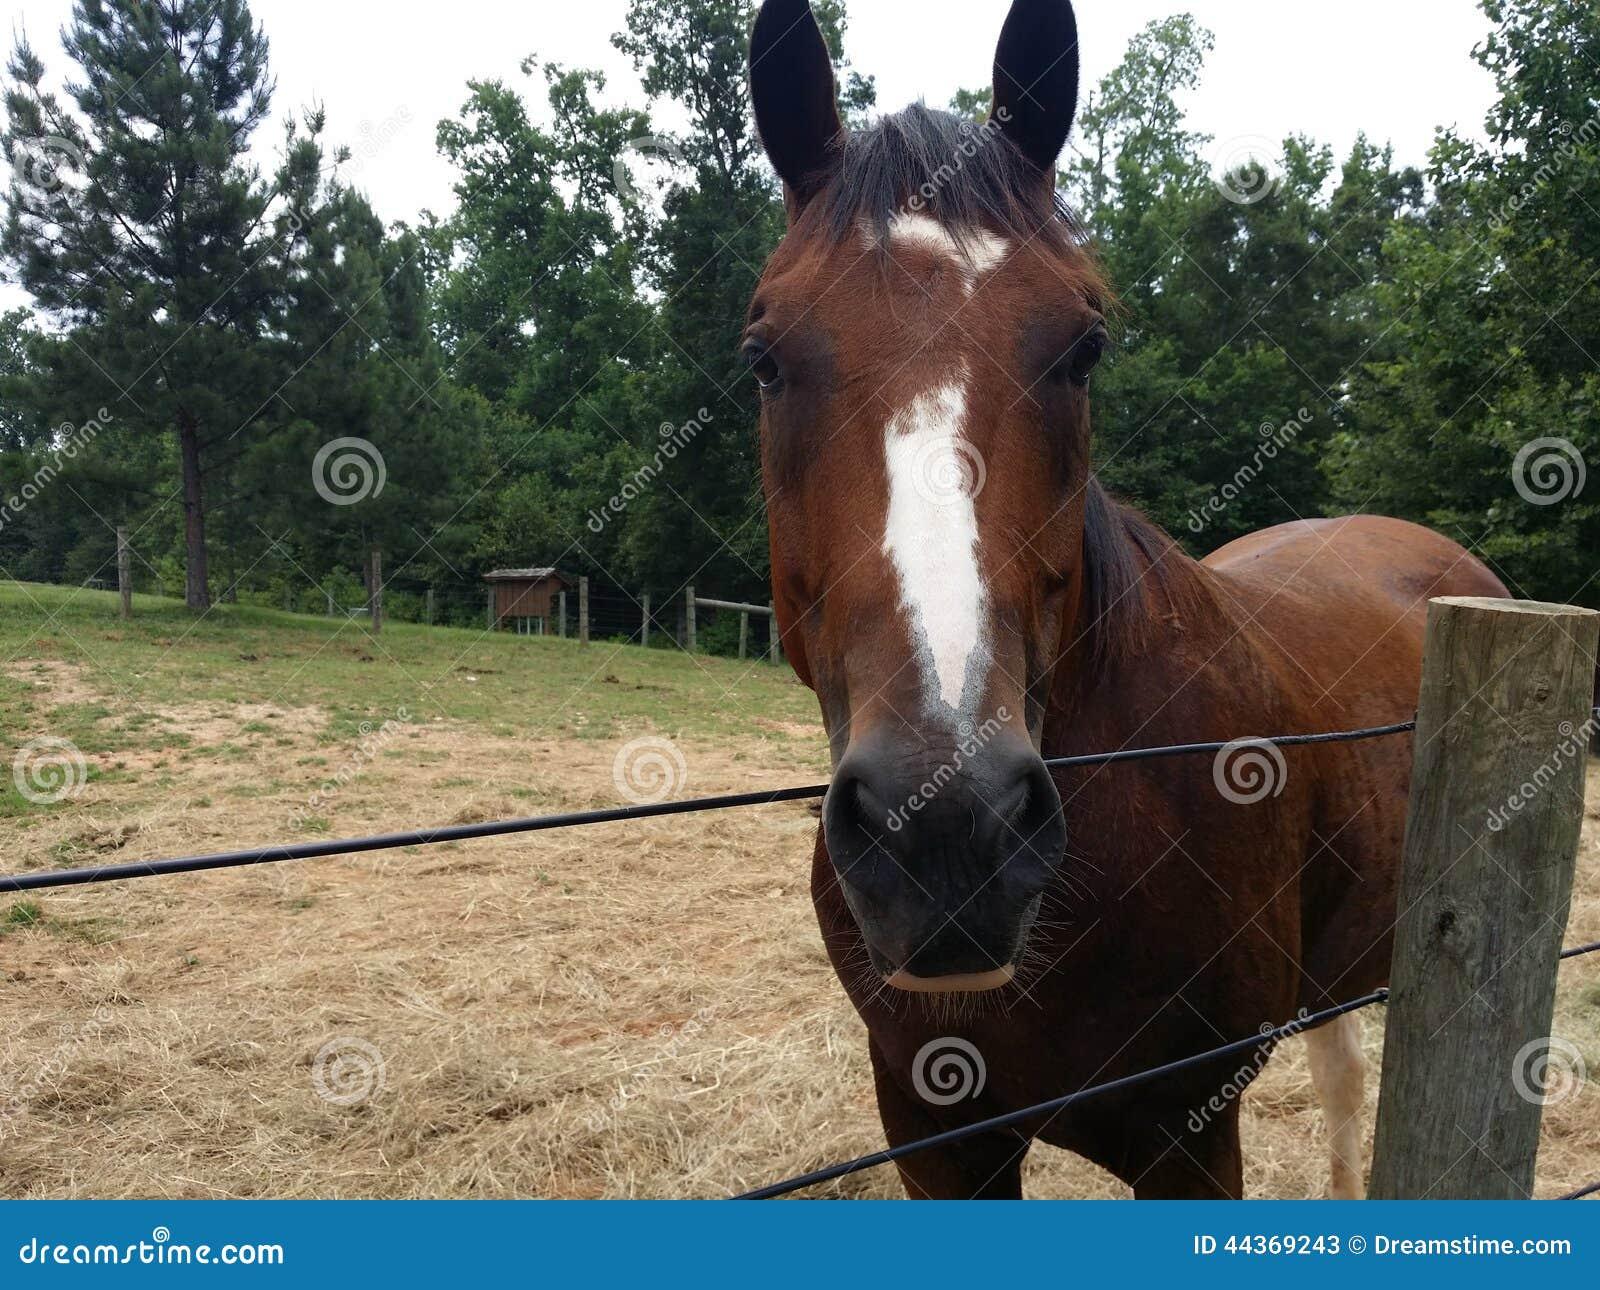 Beautiful roan horse stock image image of country stables 44369243 download beautiful roan horse stock image image of country stables 44369243 m4hsunfo